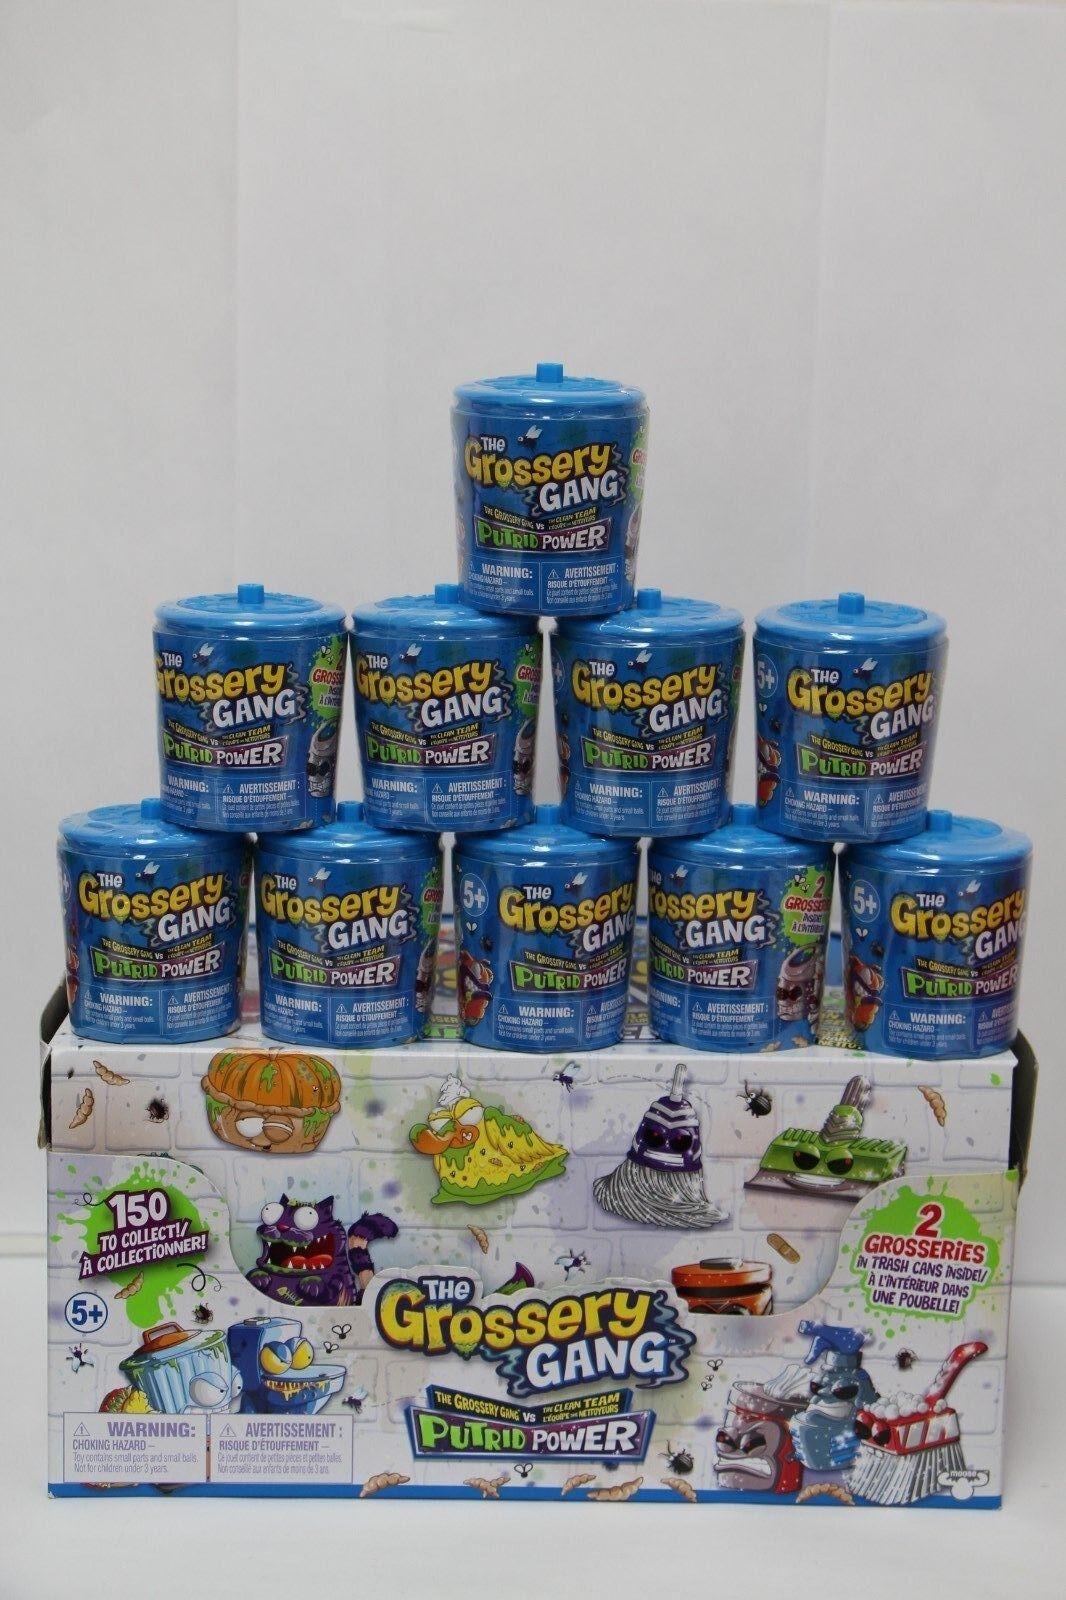 The Grossery Gang Putrid Power 2 Grosseries blind capsule Lot Lot Lot of 10 630a51